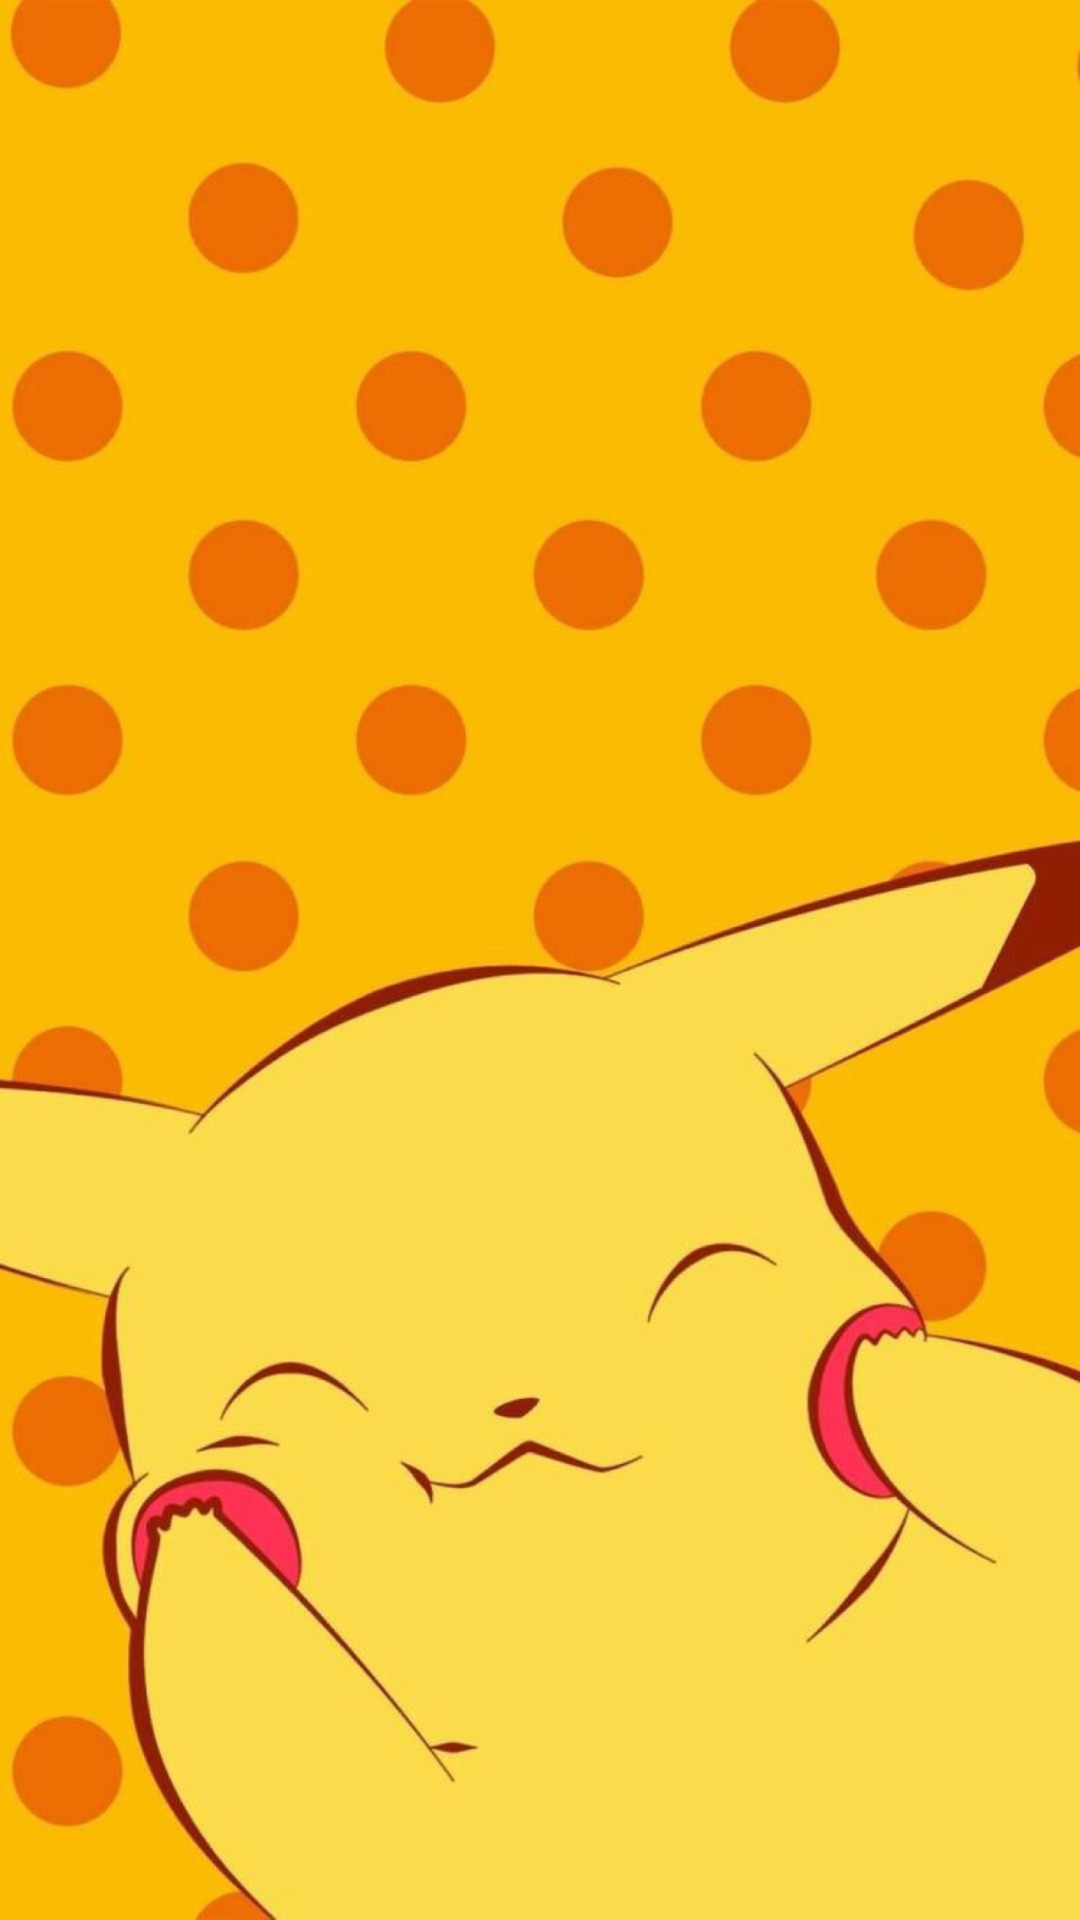 Pokemon iPhone Wallpaper 1080x1920